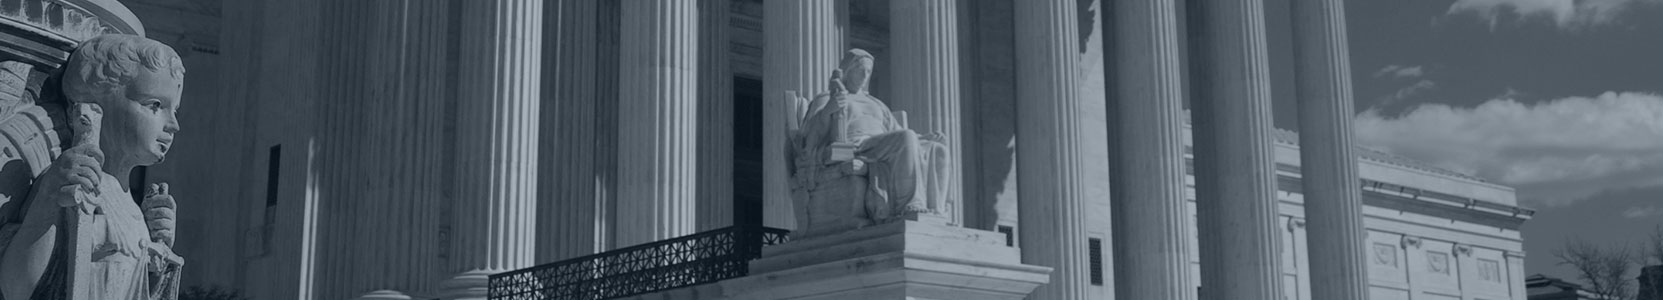 Special Education Law NYC Mayerson & Associates